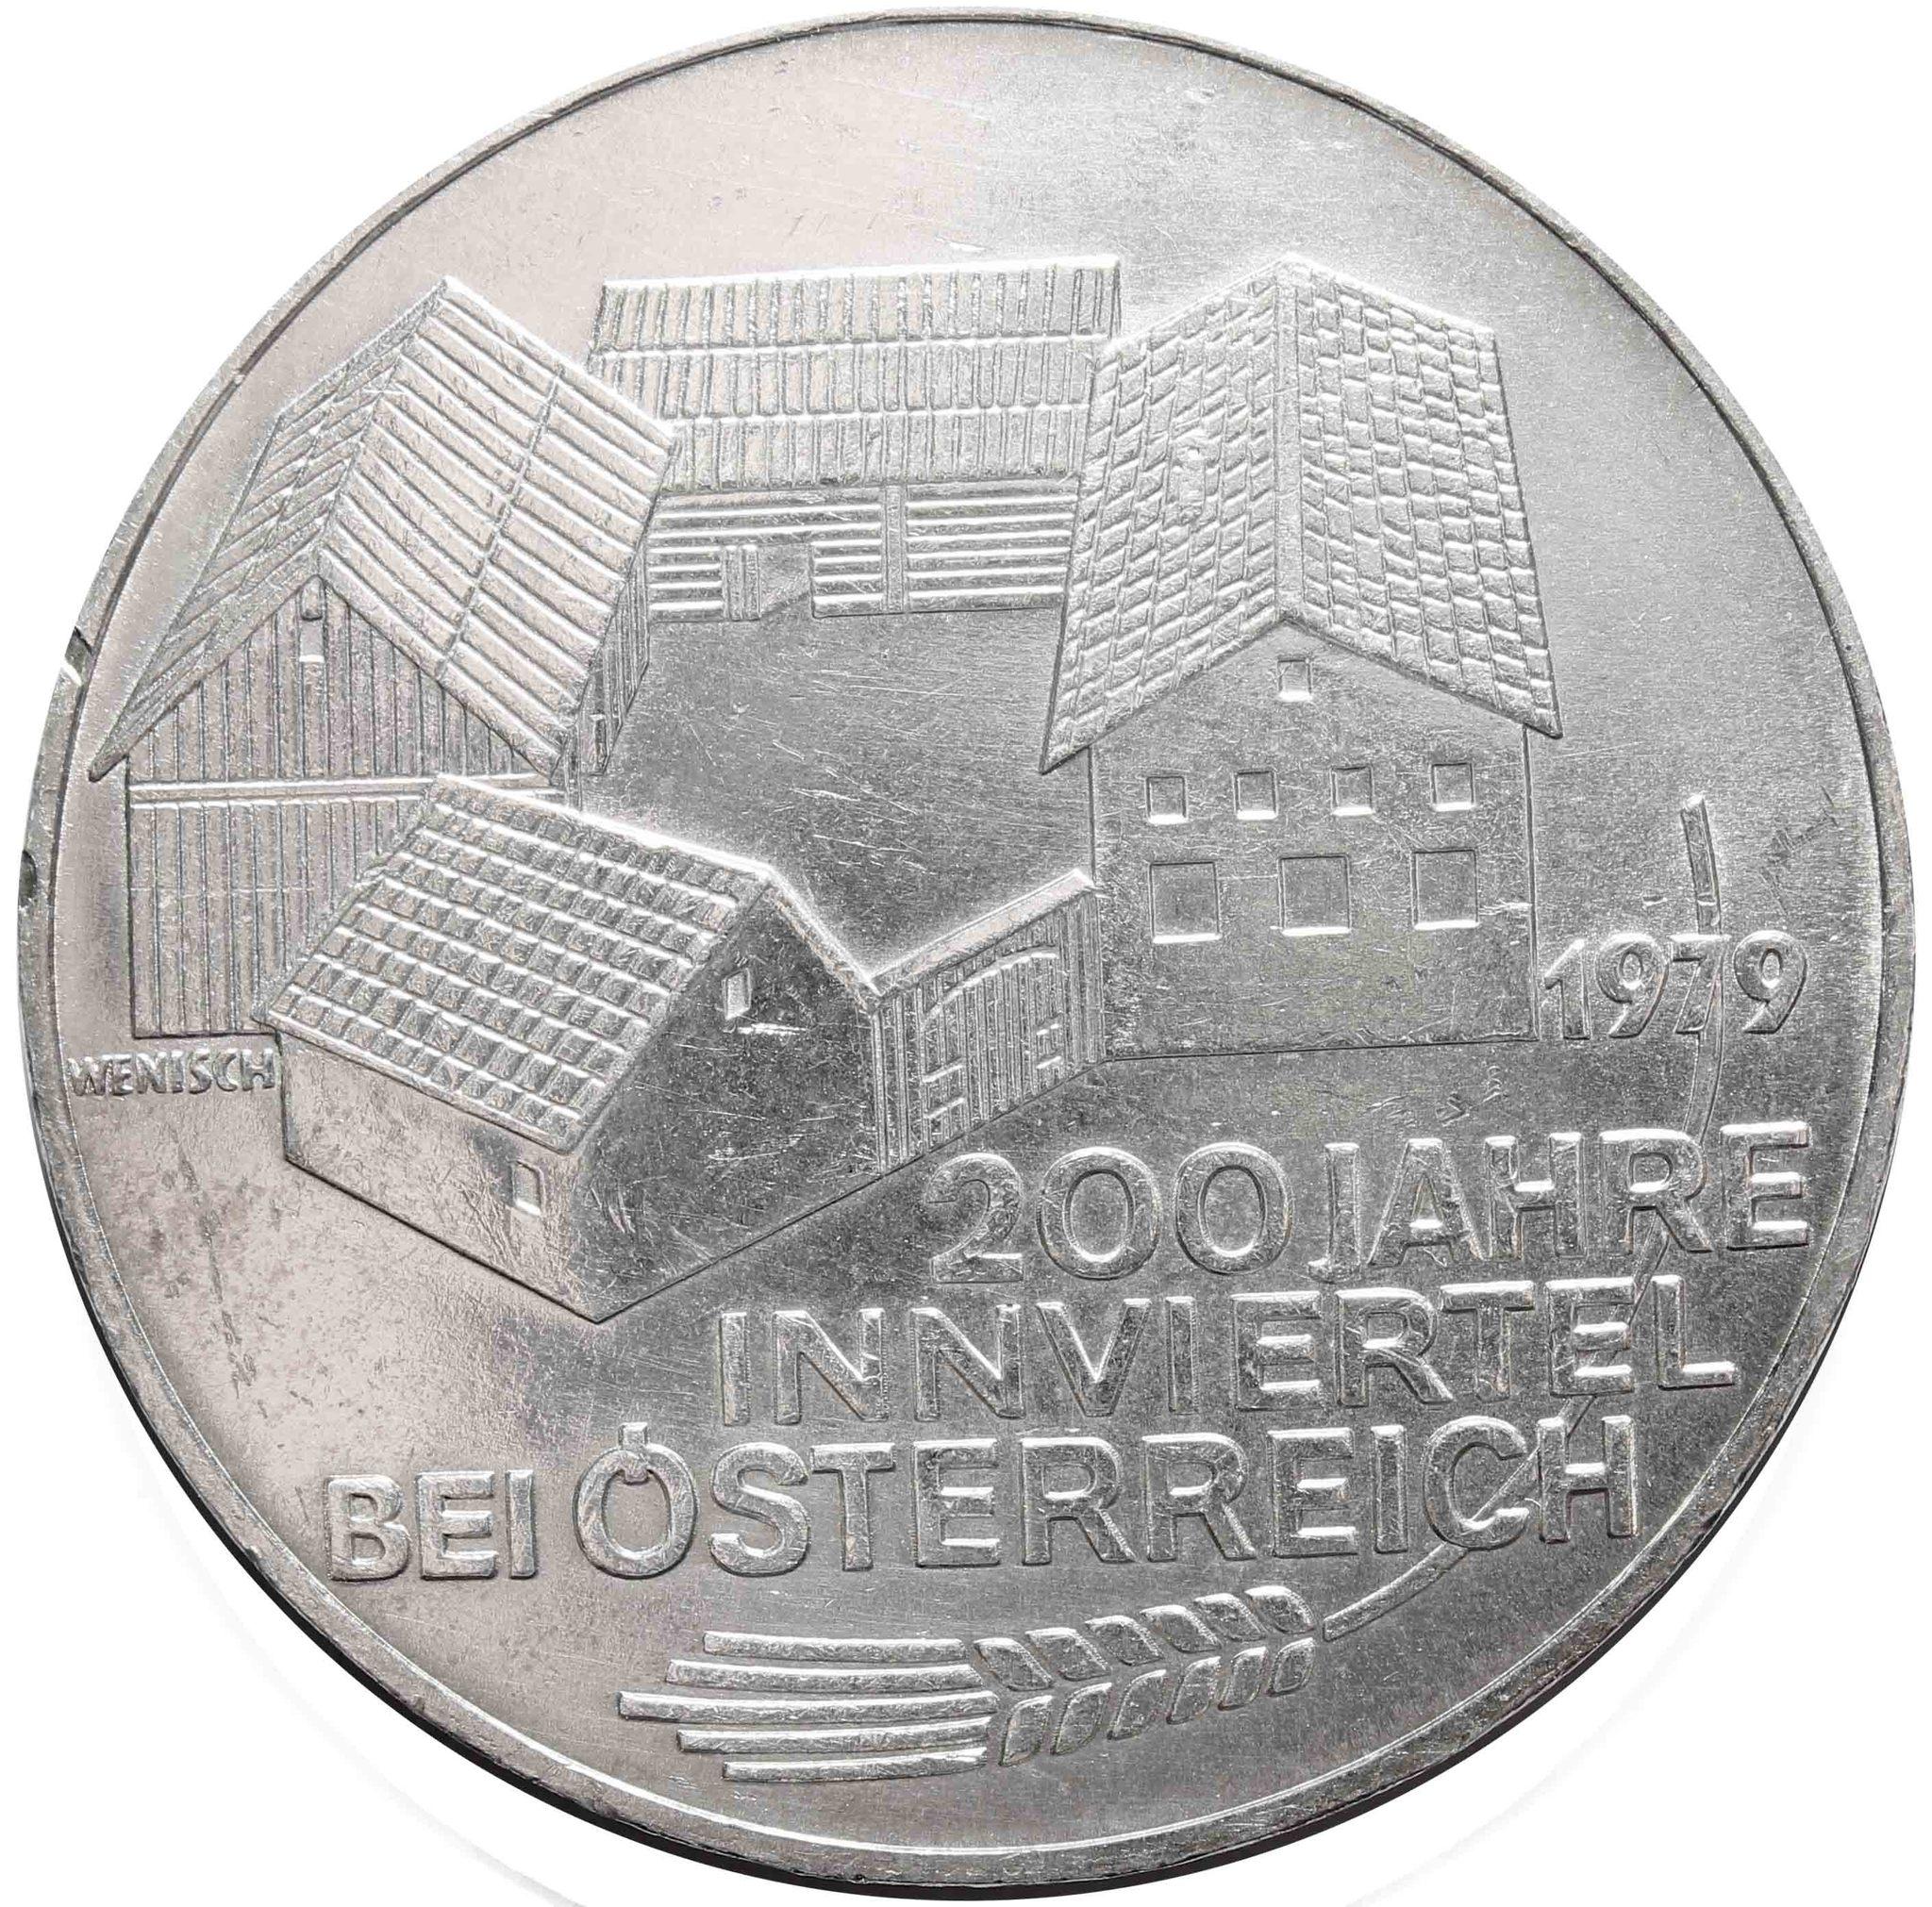 100 шиллингов. 200 лет области Инн. Австрия. 1979 год. Серебро. AU